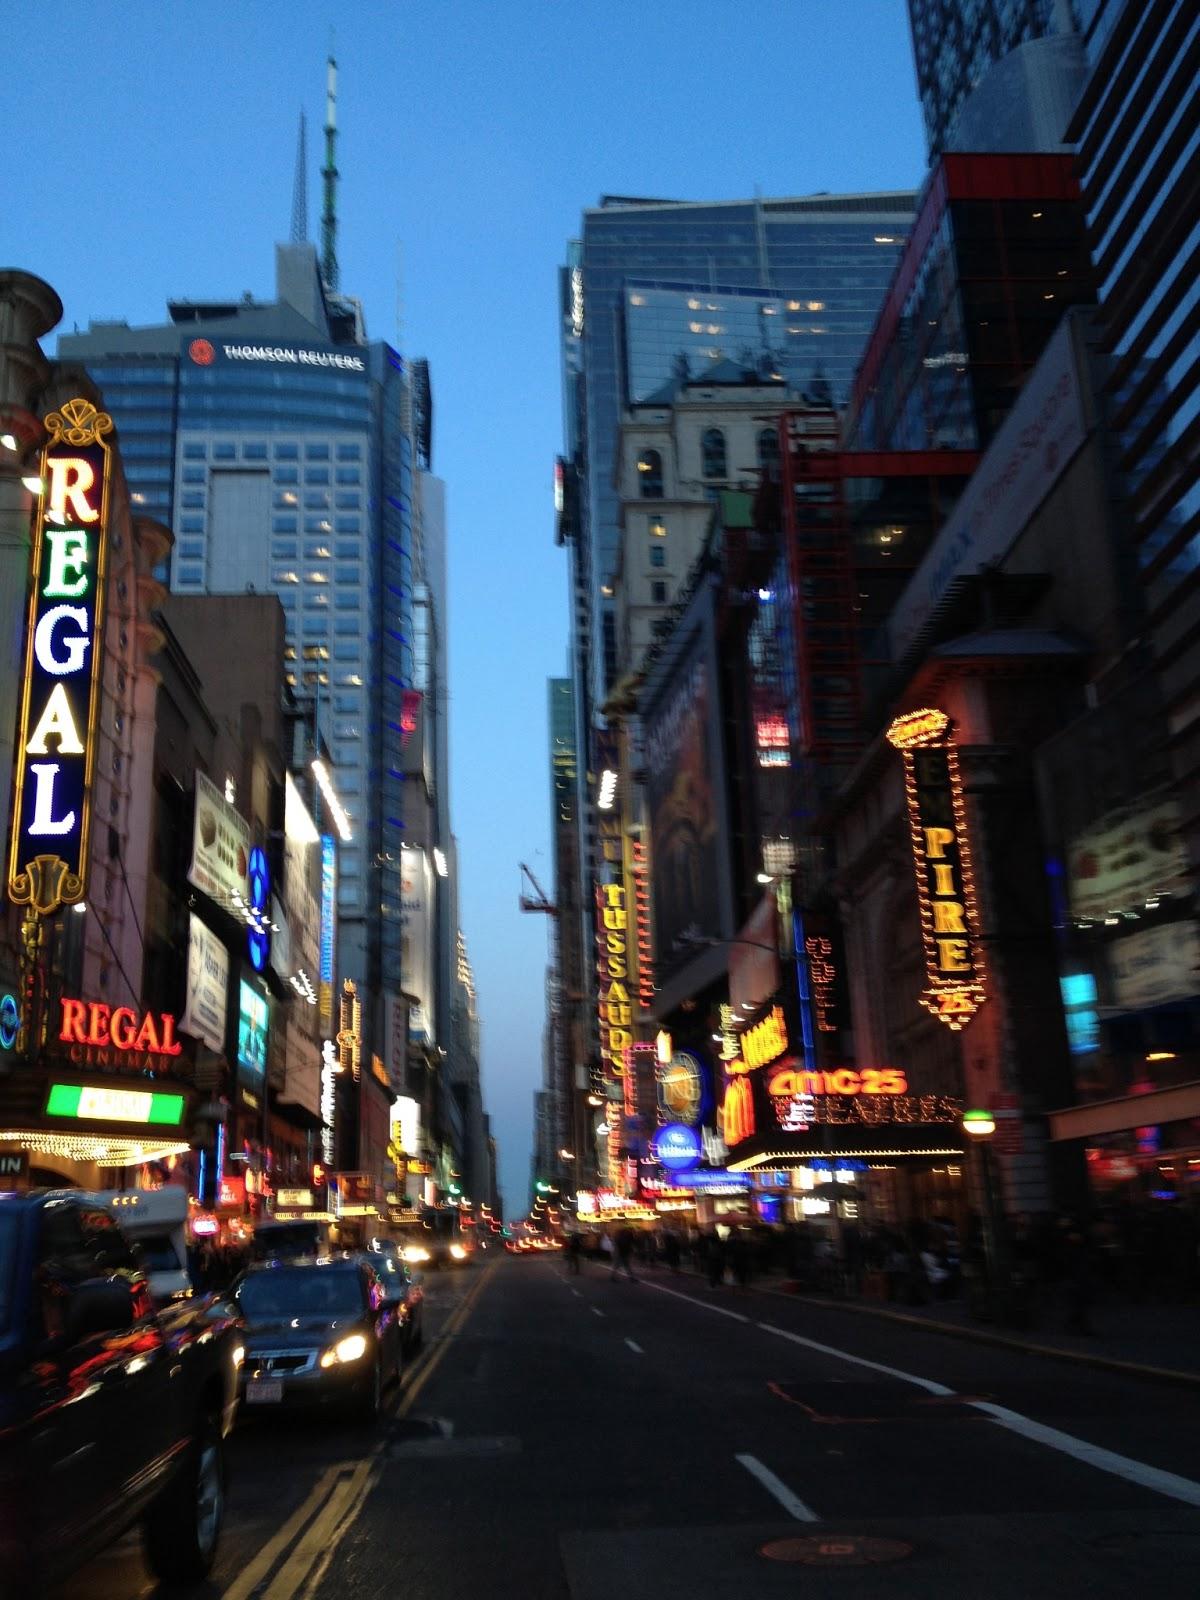 Travel blog, new york city, new york, travel new york, salt lake city,  fashion blog, fashion blogger, style blog, style blogger, mens fashion, mens fashion blog, mens style, mens style blog, womens style blog, anthropologie ootd blog, anthropologie ootd, anthropologie, ootd, mens ootd, womens ootd, time square, times square,